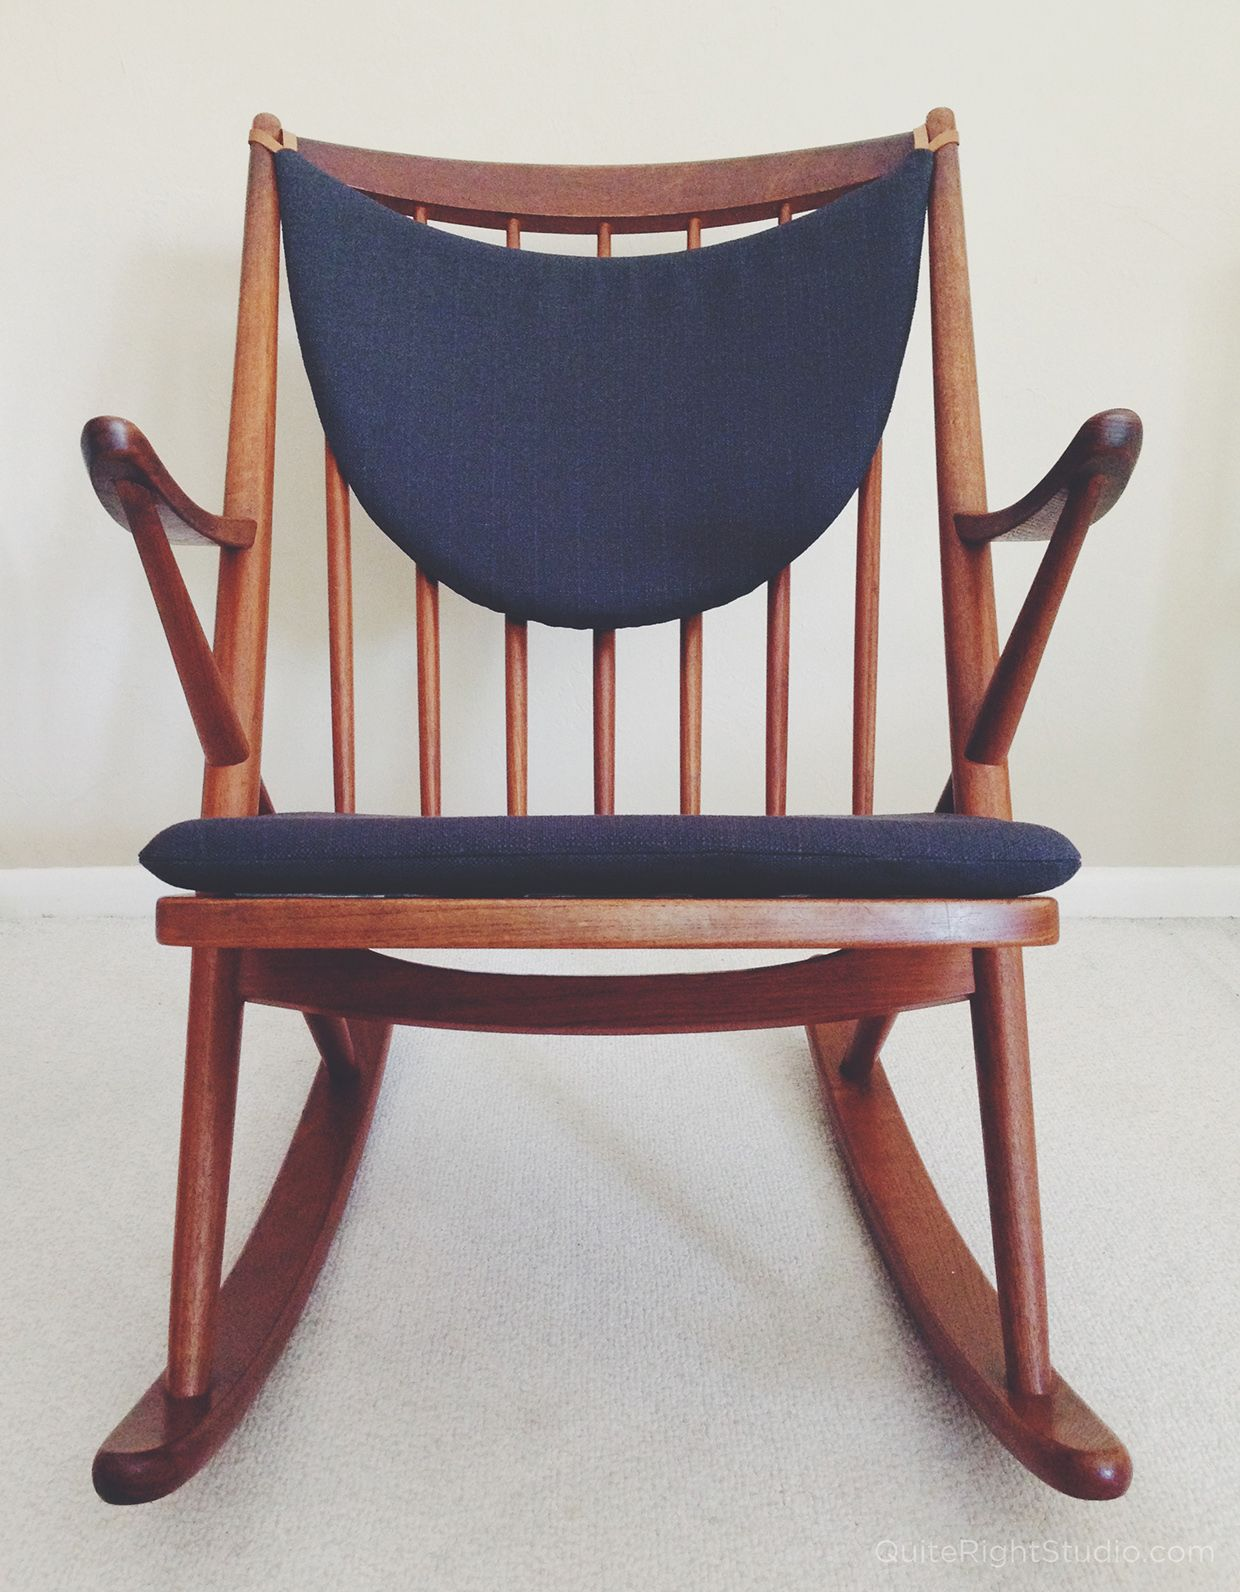 Frank reenskaug rocking chair - Restored Frank Reenskaug Rocking Chair